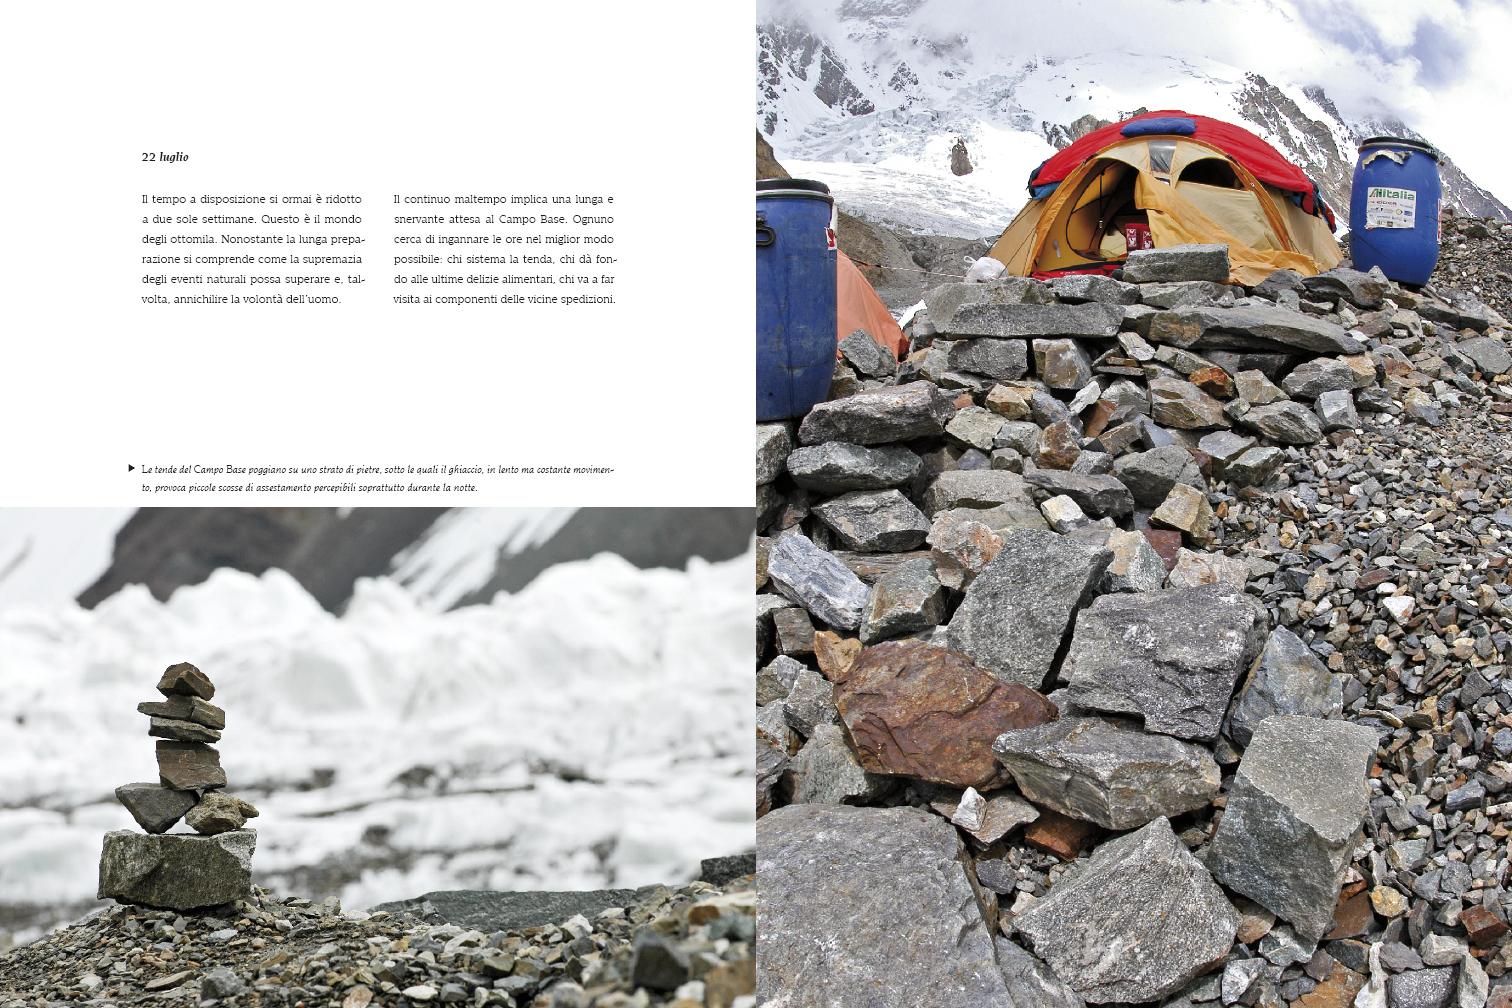 K2 EXPEDITION 1954-2004 Giuseppe Ghedina Fotografo - 077.jpg